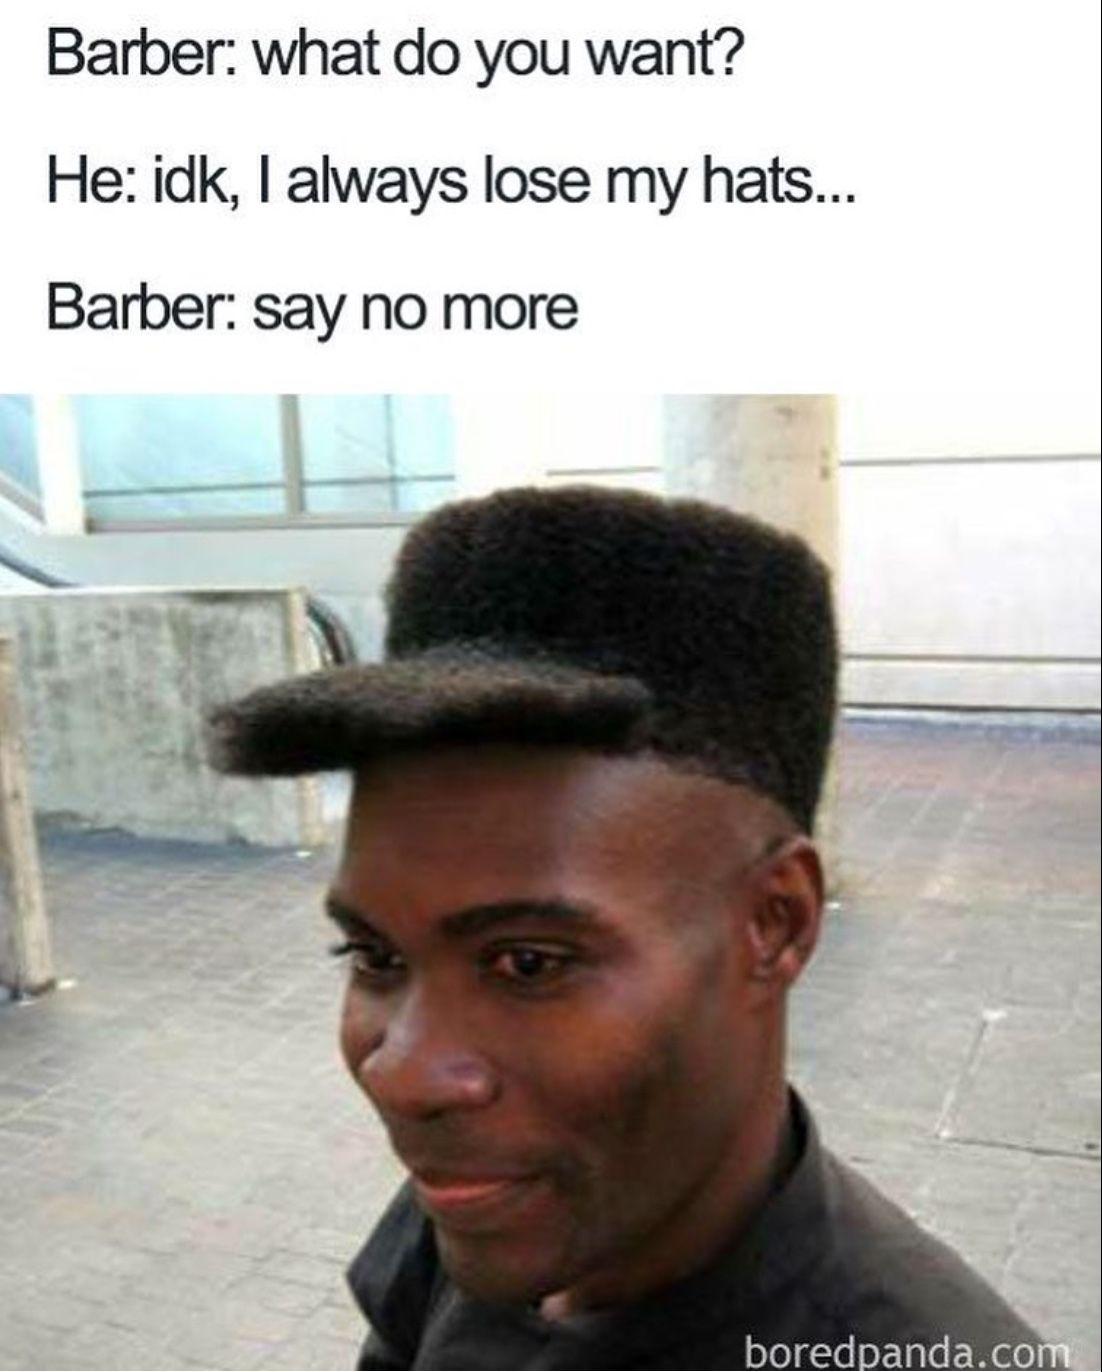 30 Say No More Memes That Will Have You Laughing Hard The Xo Factor Haircut Quotes Funny Terrible Haircuts Haircut Memes